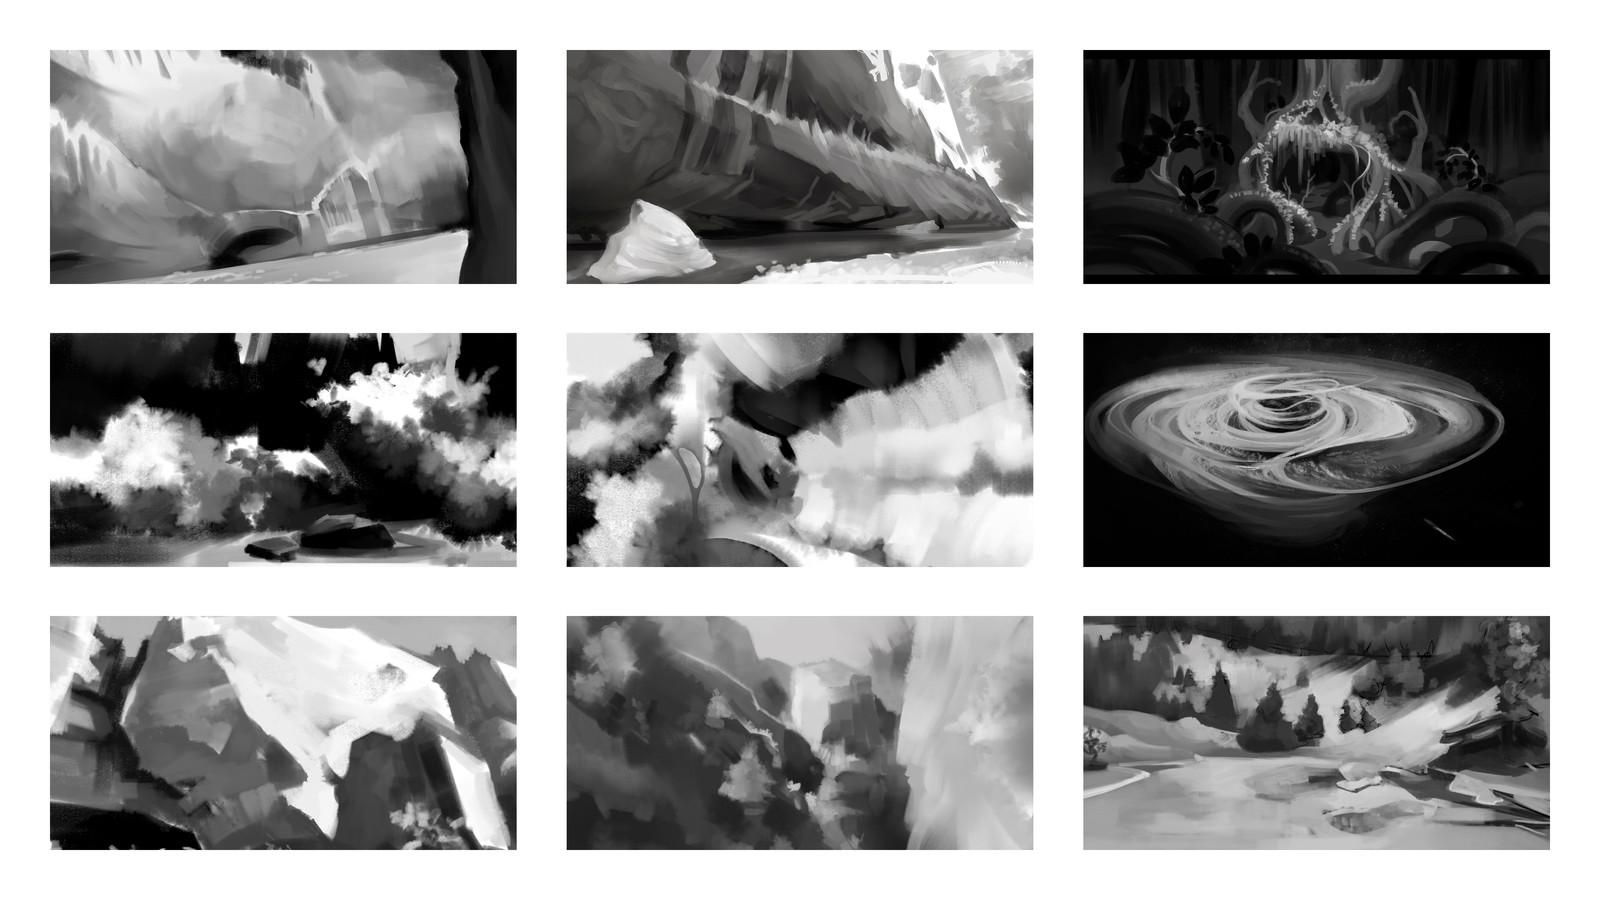 Sketchbook: Environments